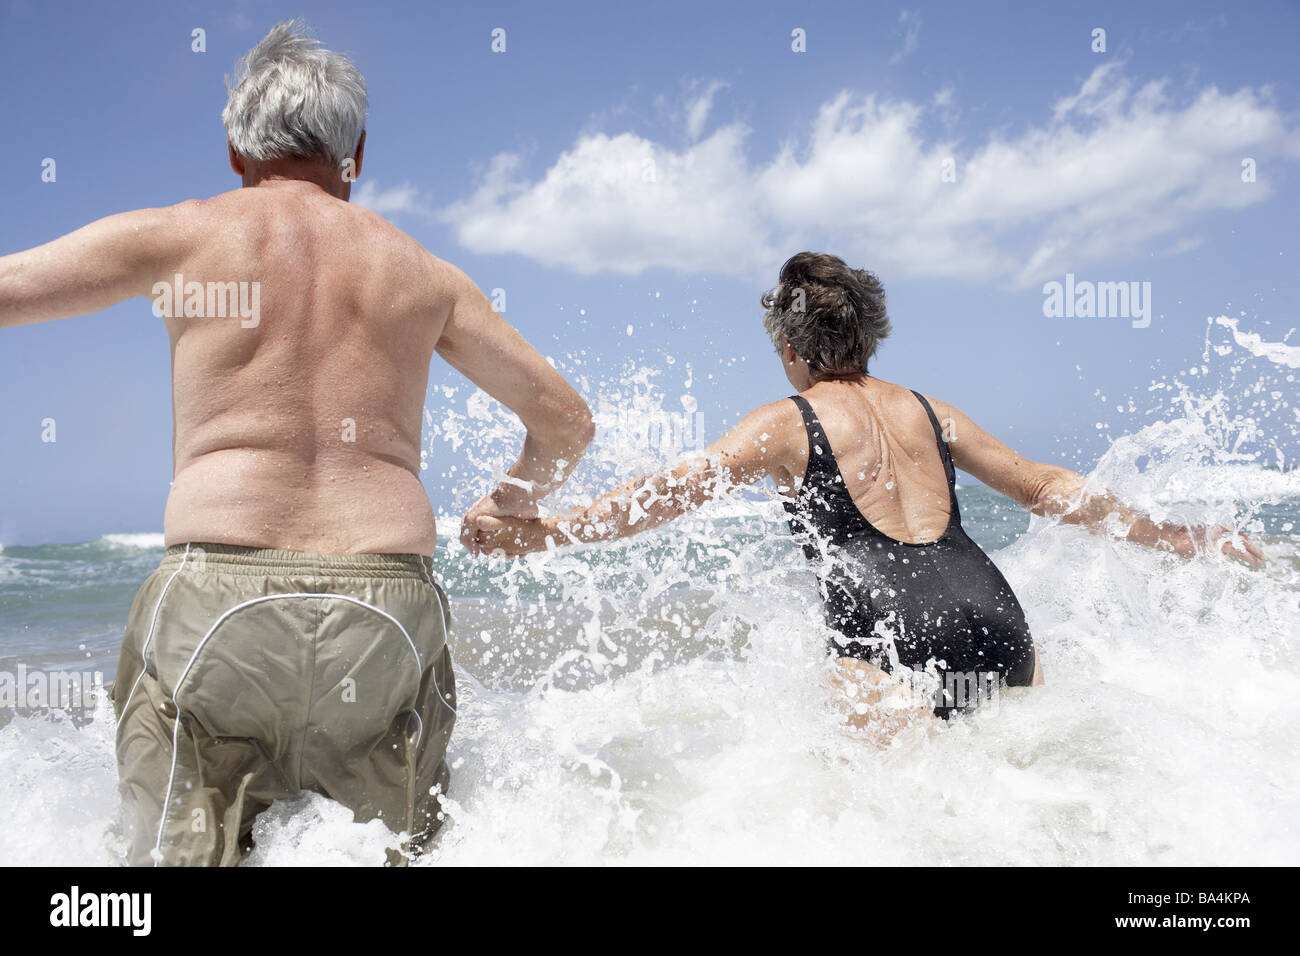 Sea surf senior-pair bath-clothing hand in hand water runs back-opinion detail series people seniors pair 60-70 - Stock Image